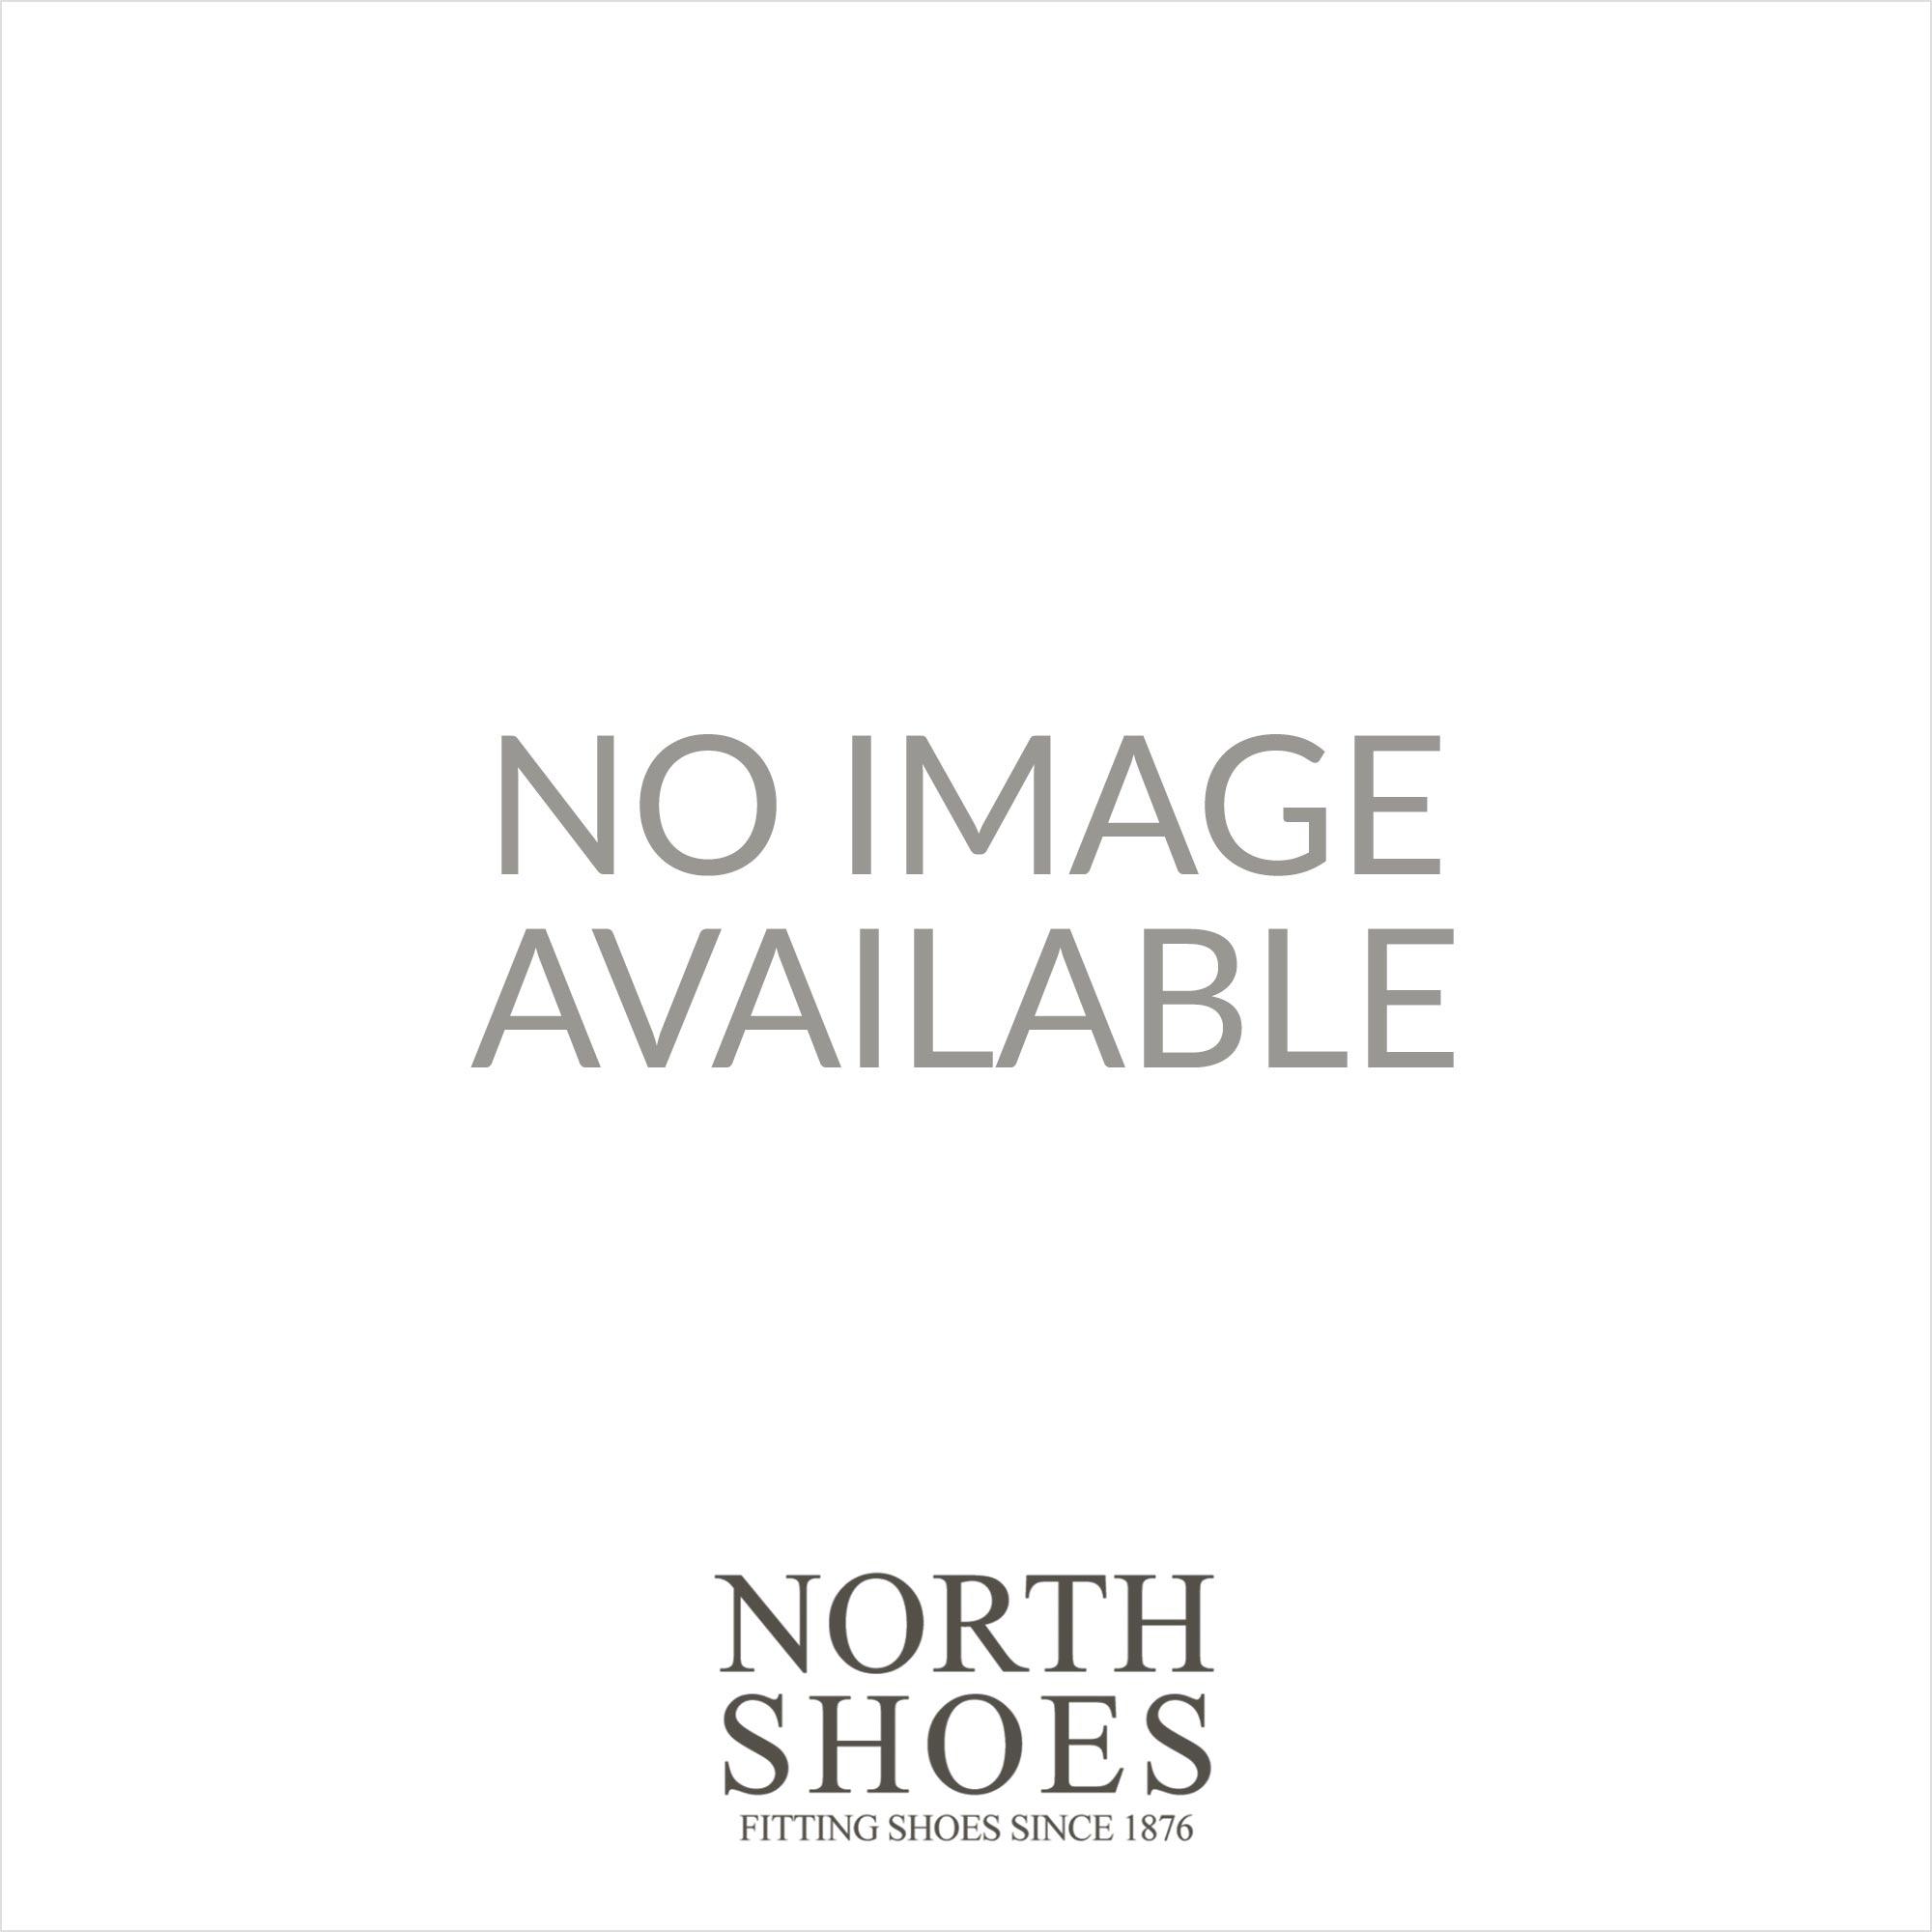 71c4b55b9c7c7 Mens Loake Kruger Black Leather Mens Brogue Derby Lace Up Shoes ...